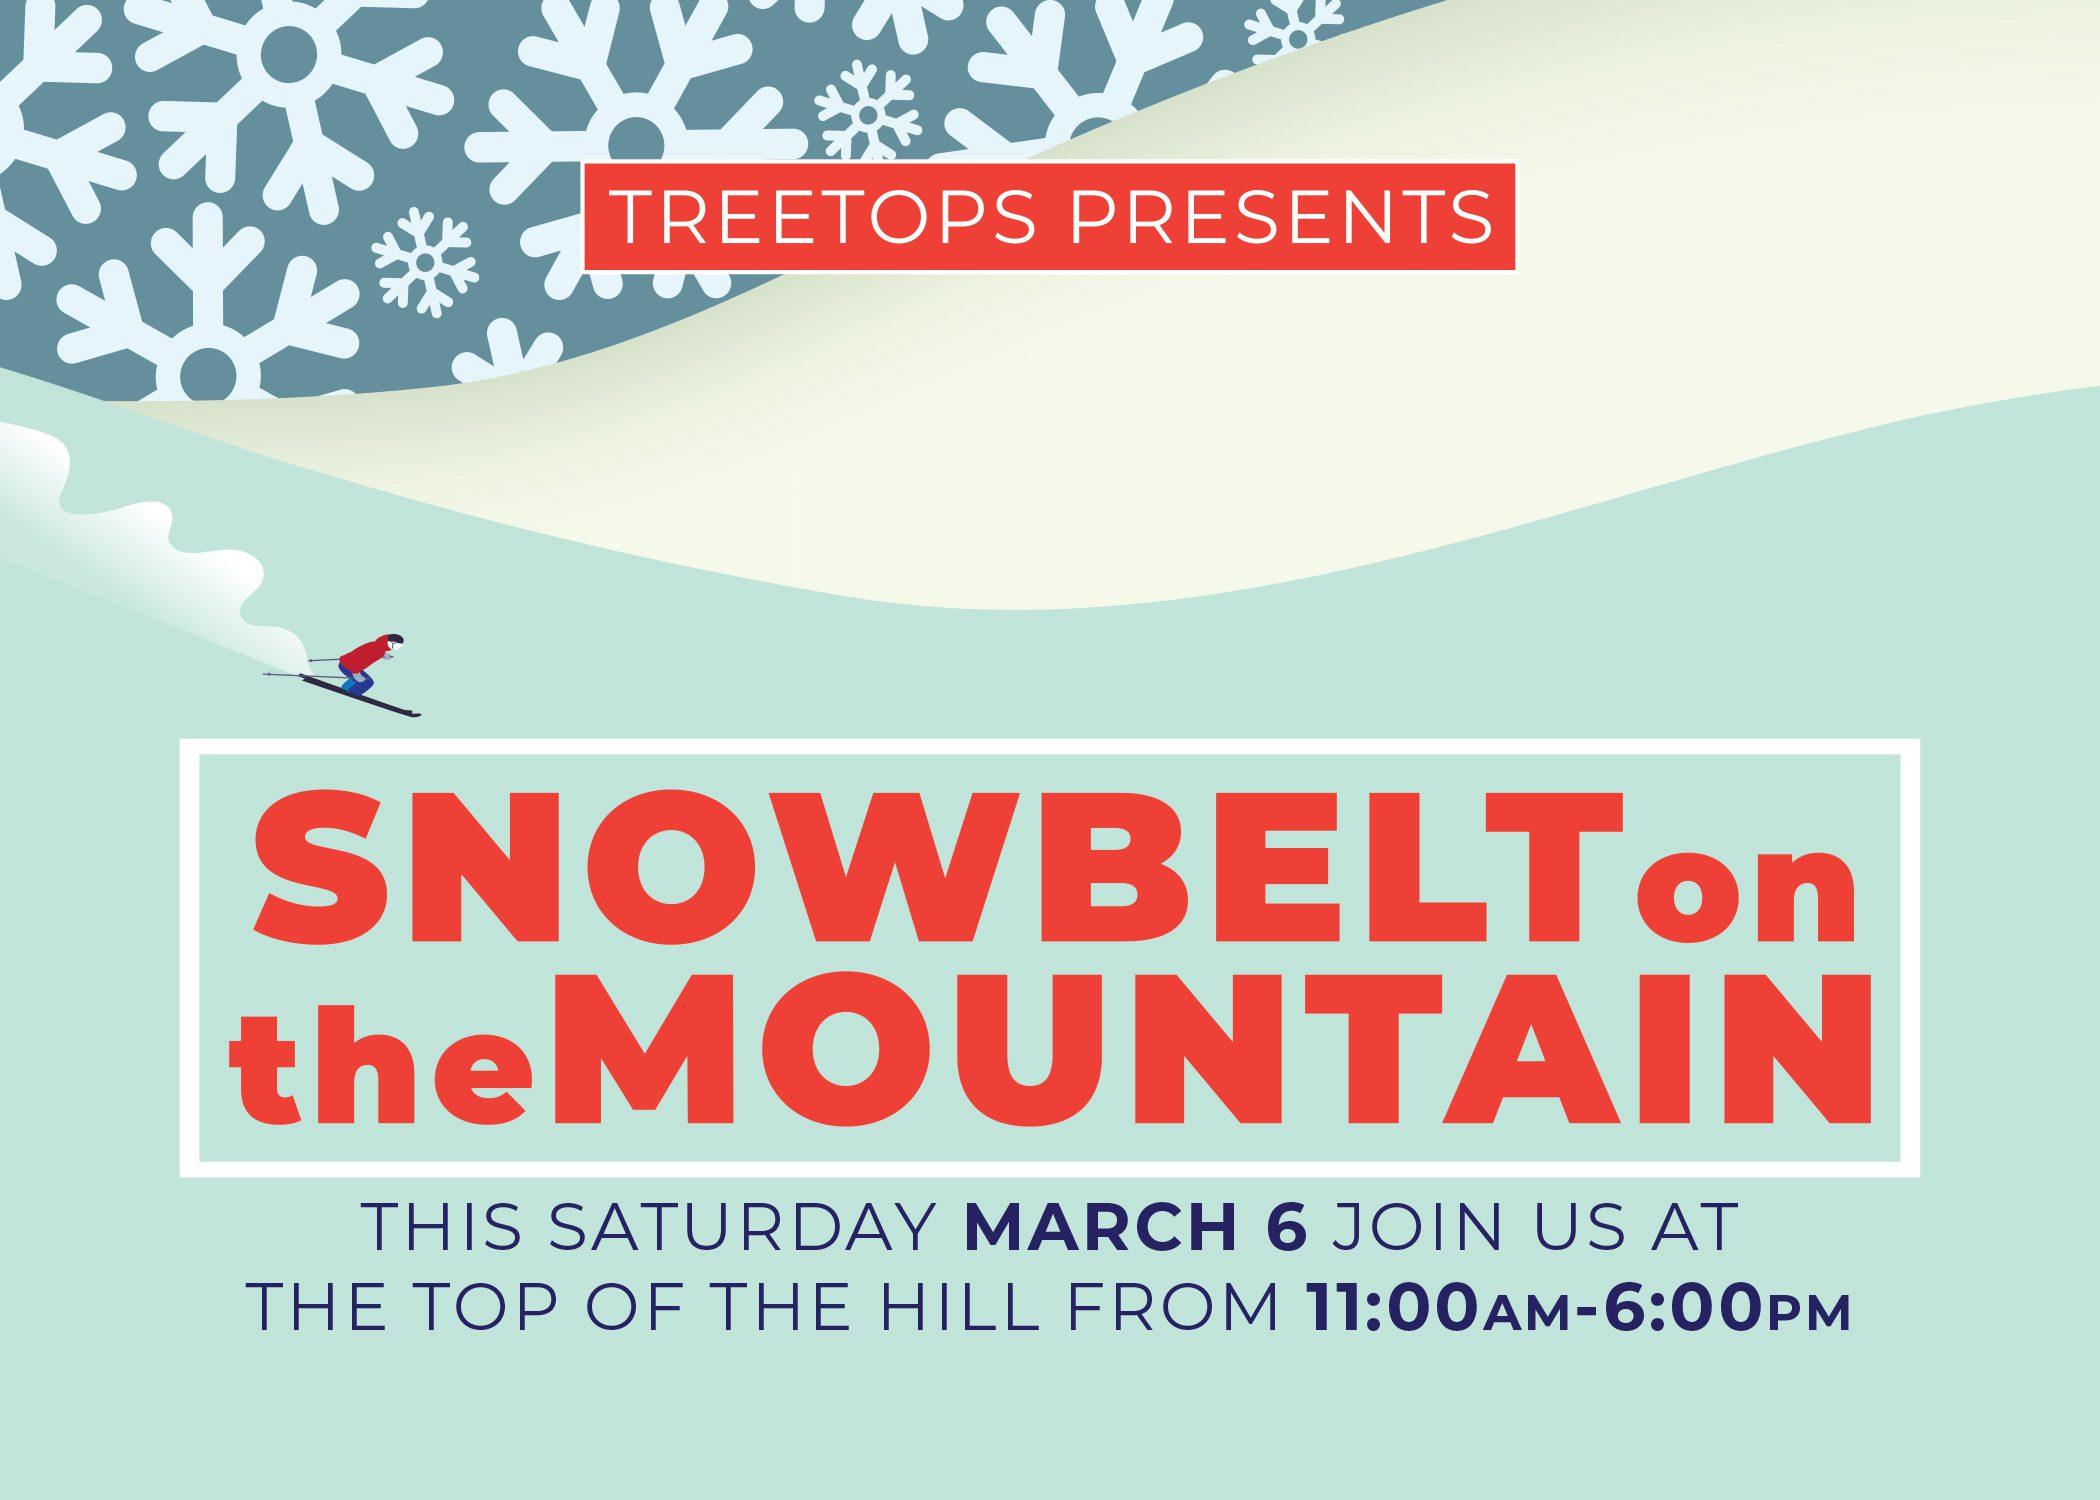 Snowbelt On The Mountain